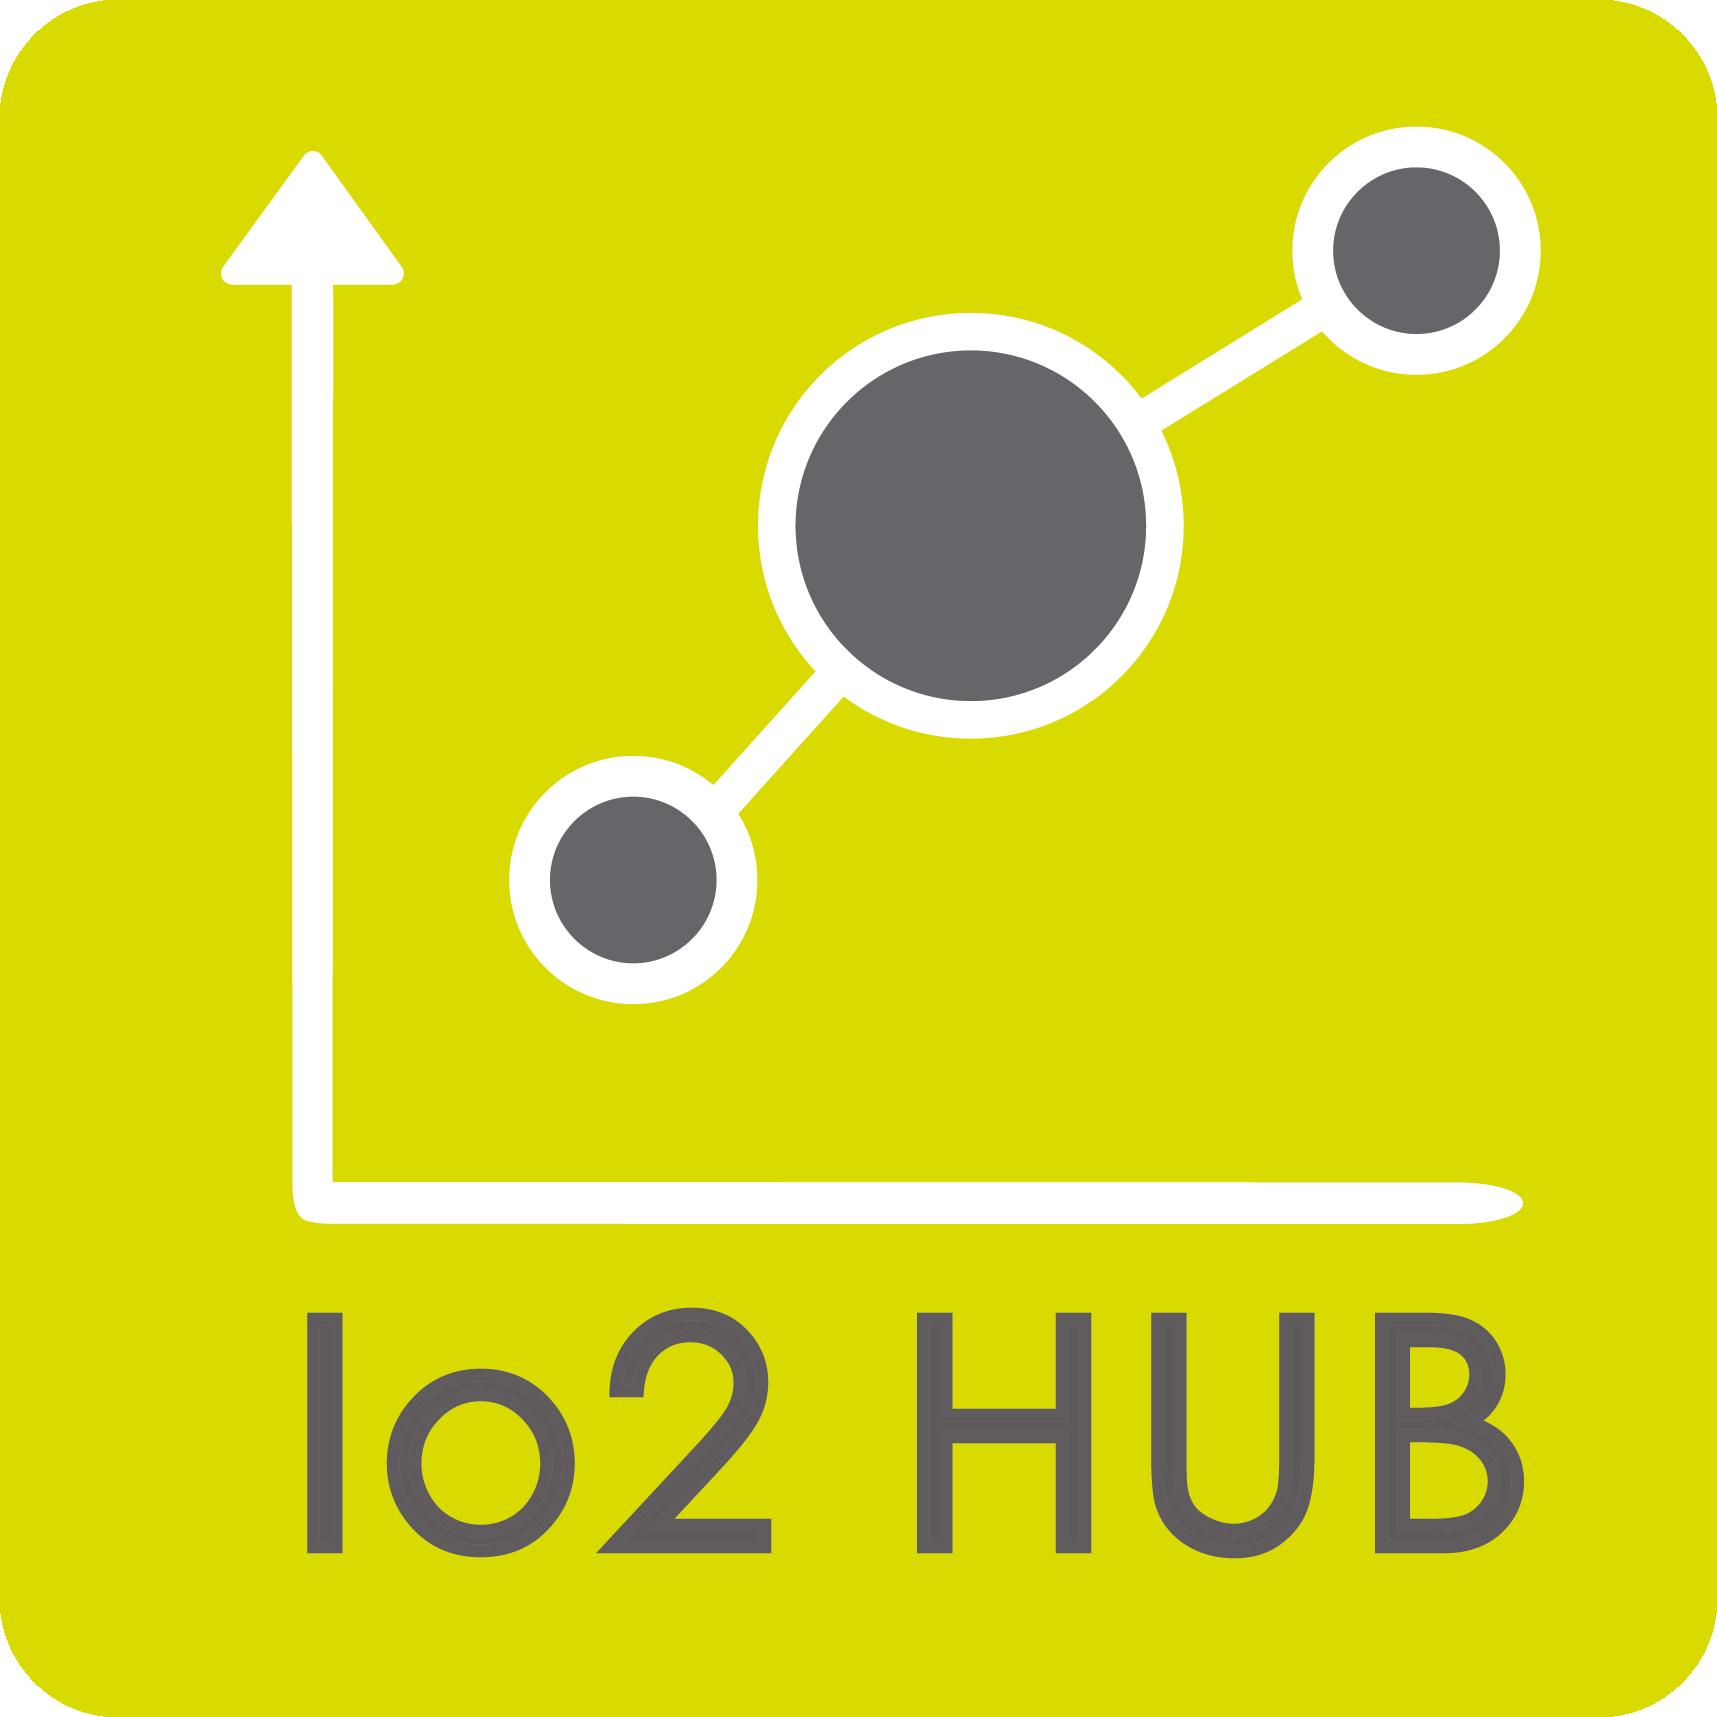 Io2 Hub